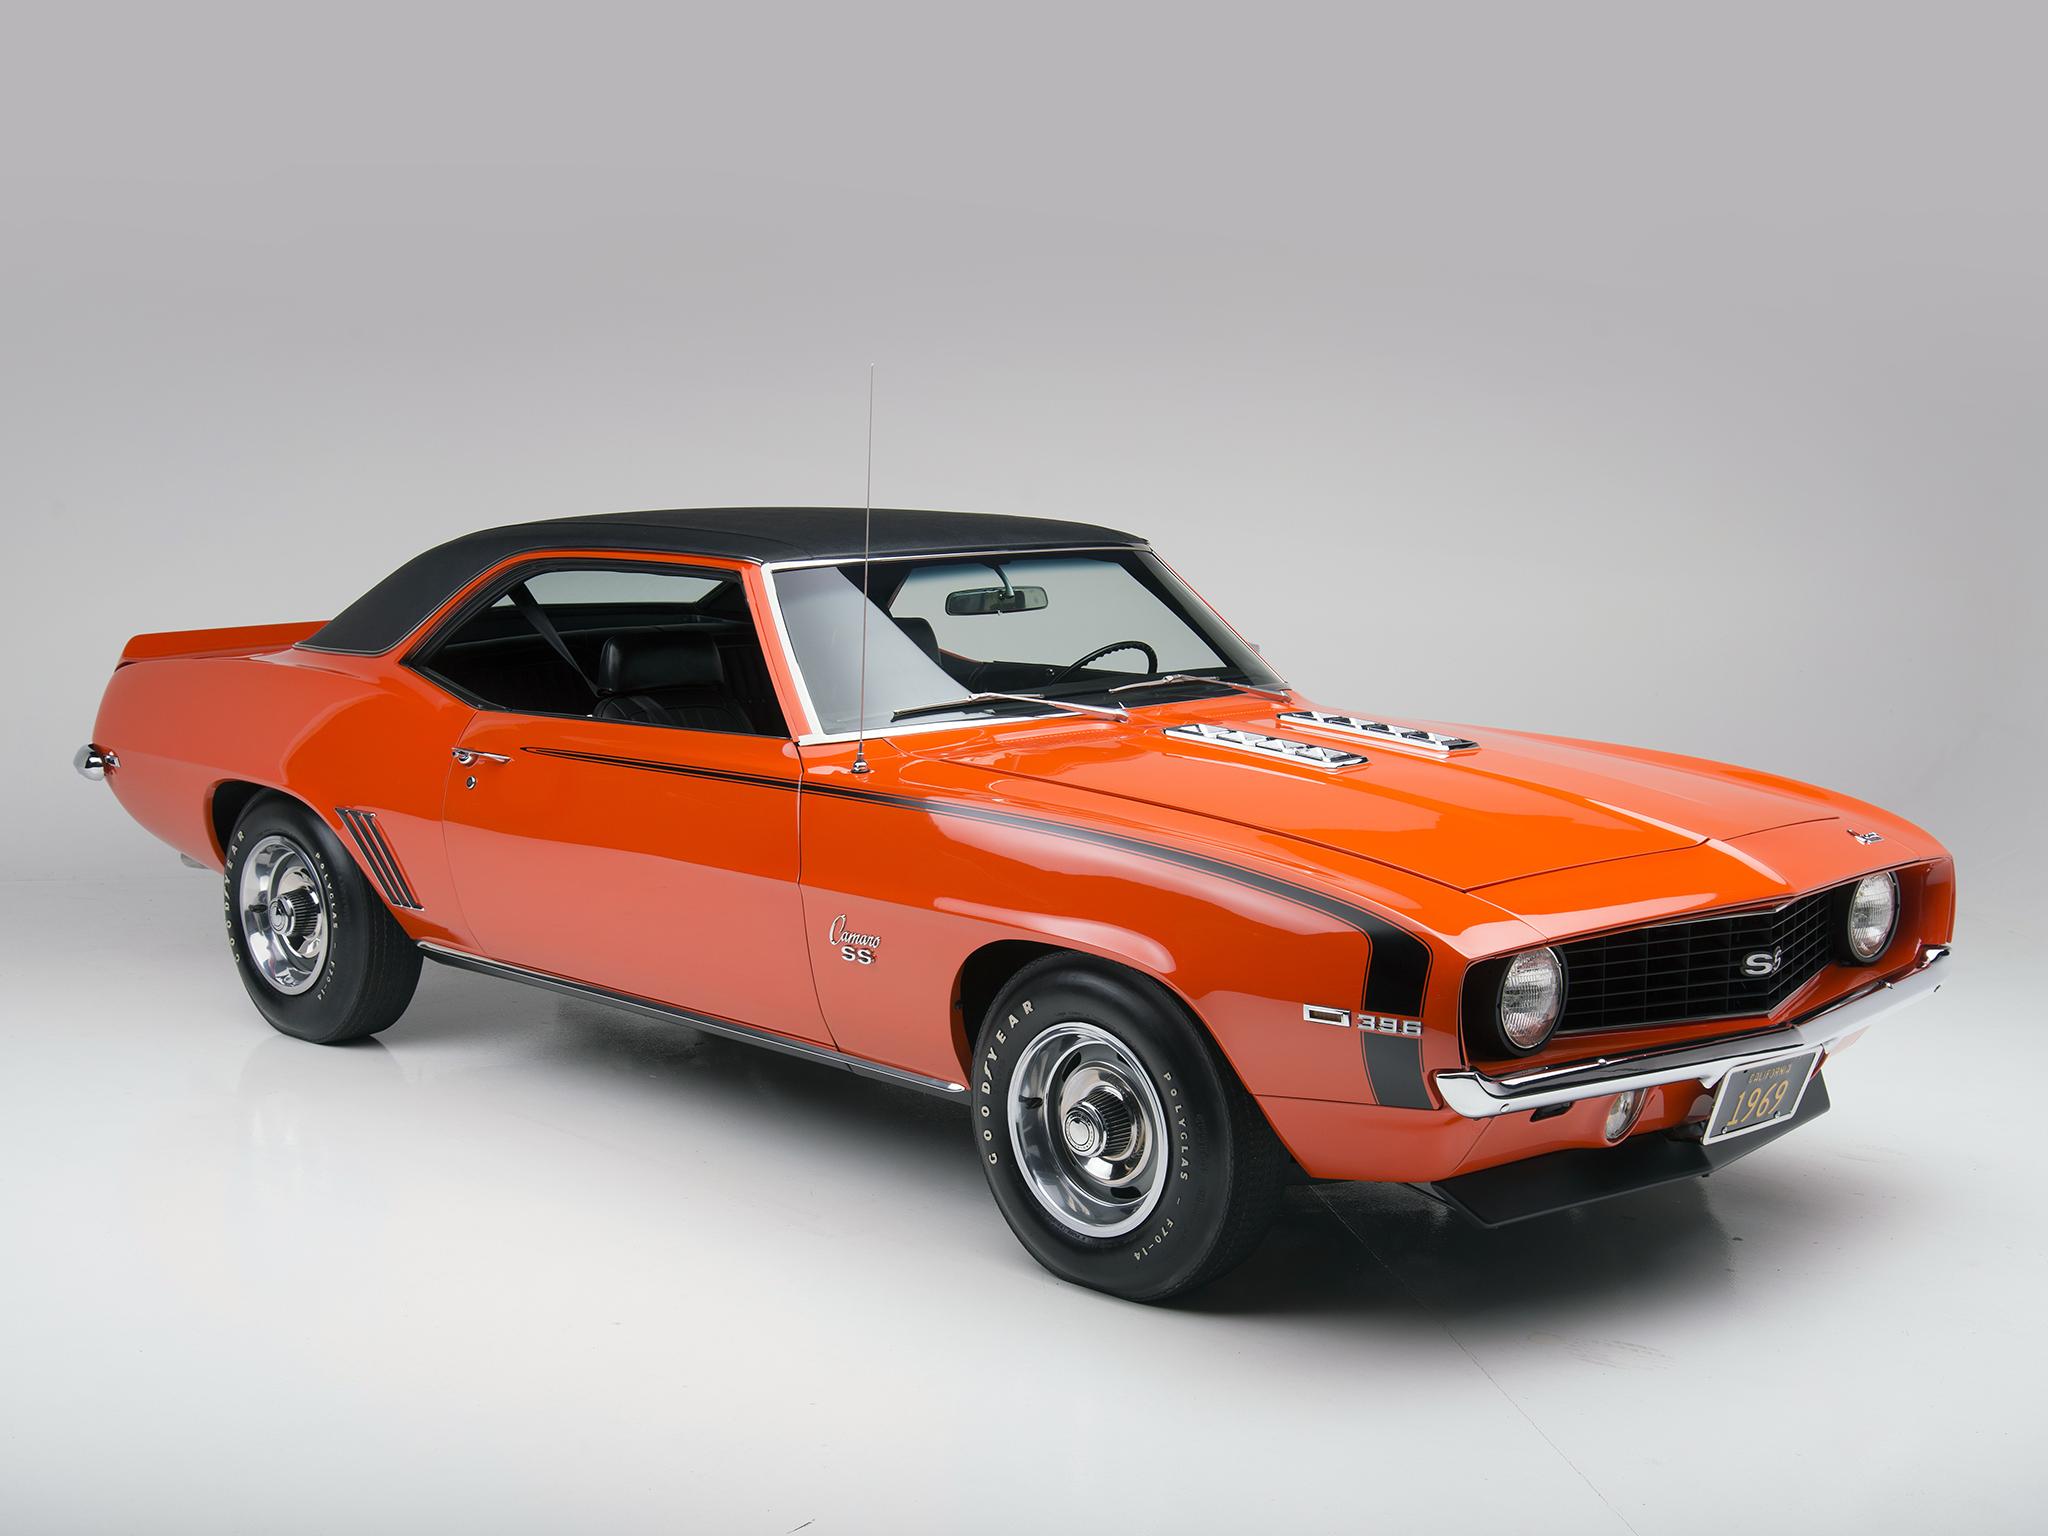 1969 Chevrolet Camaro S 396 Classic Muscle T Wallpaper 2048x1536